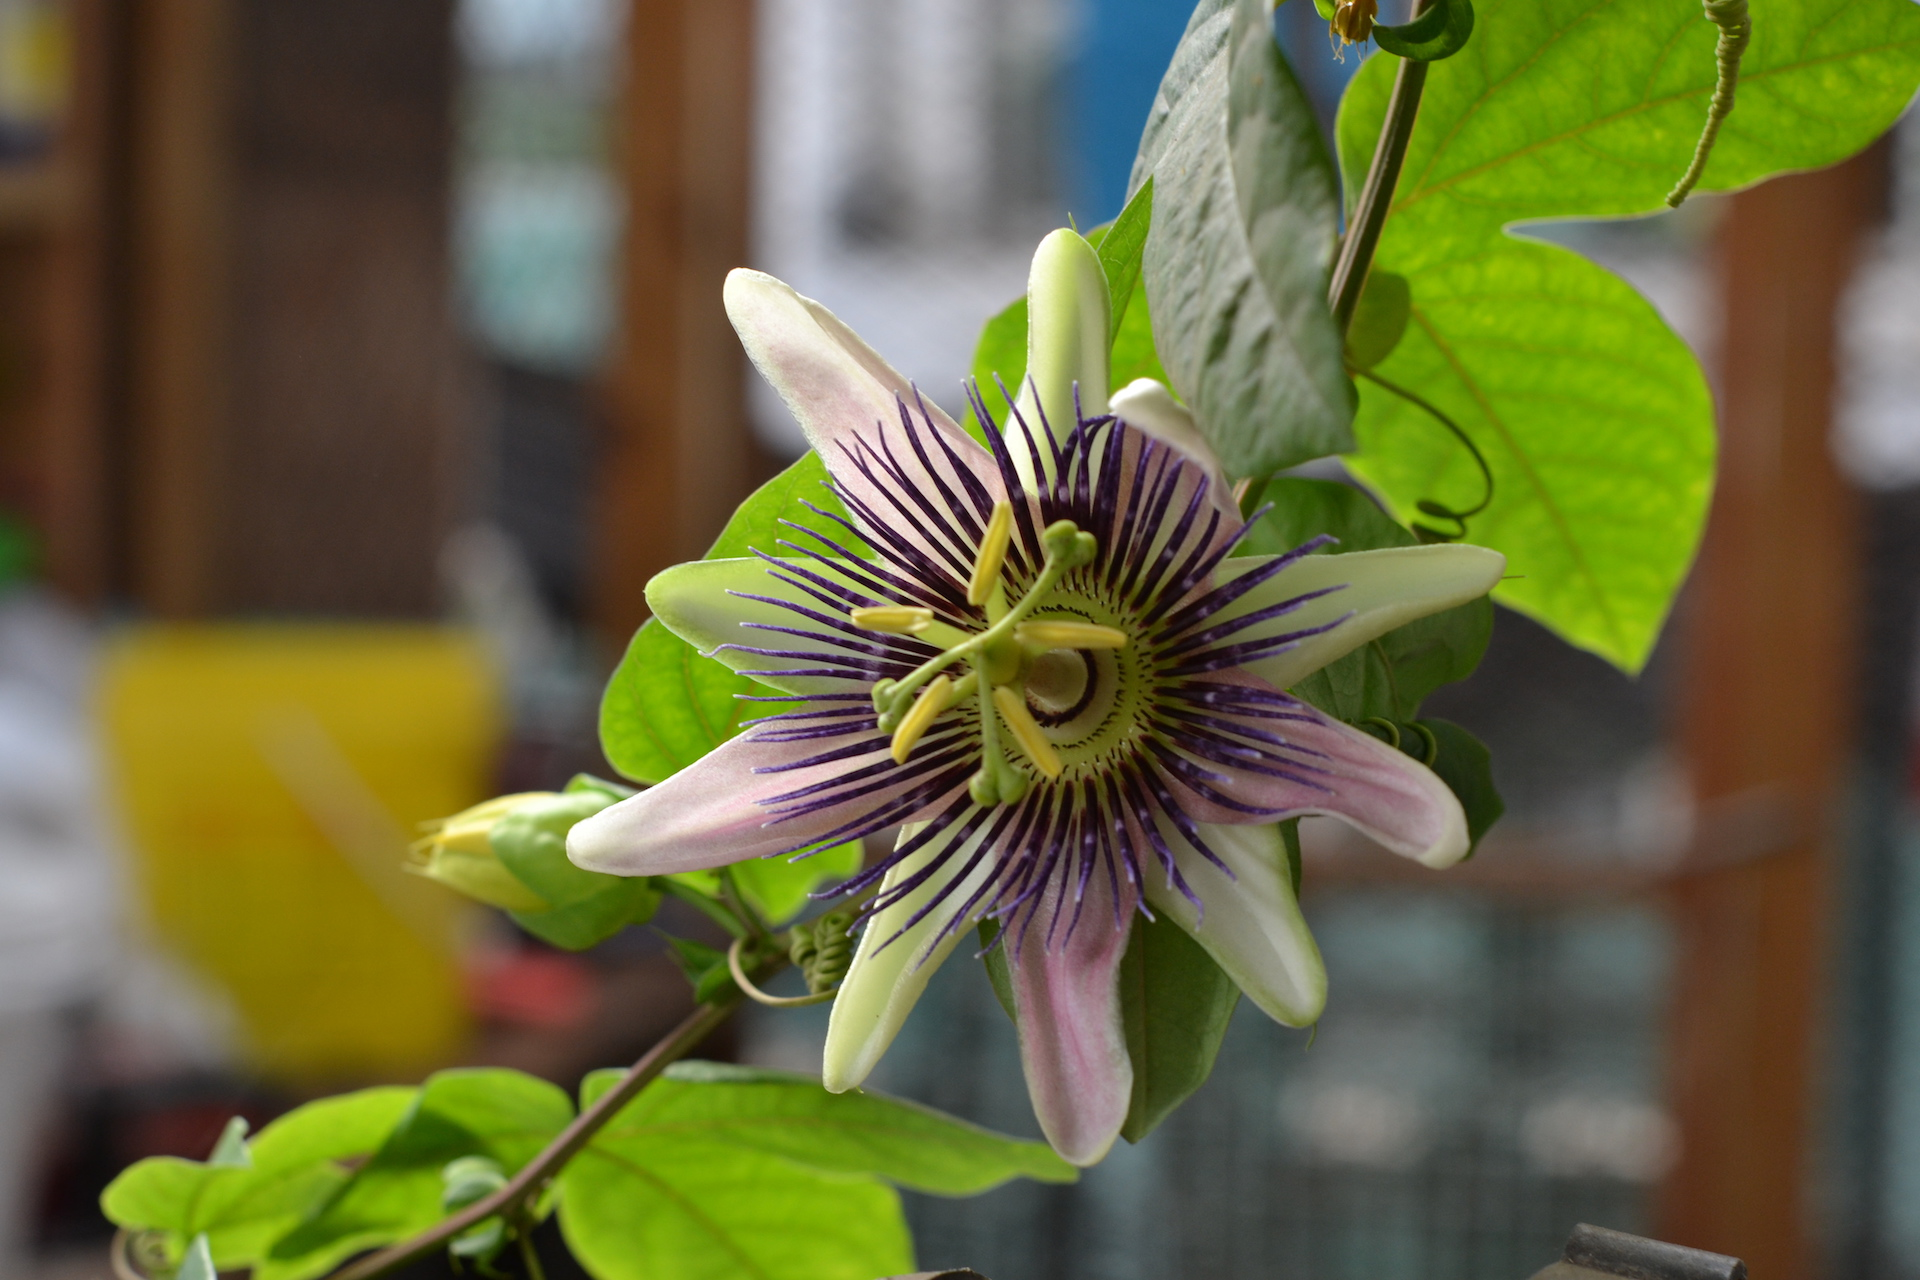 Flower blooming inside greenhouse, species unknown.